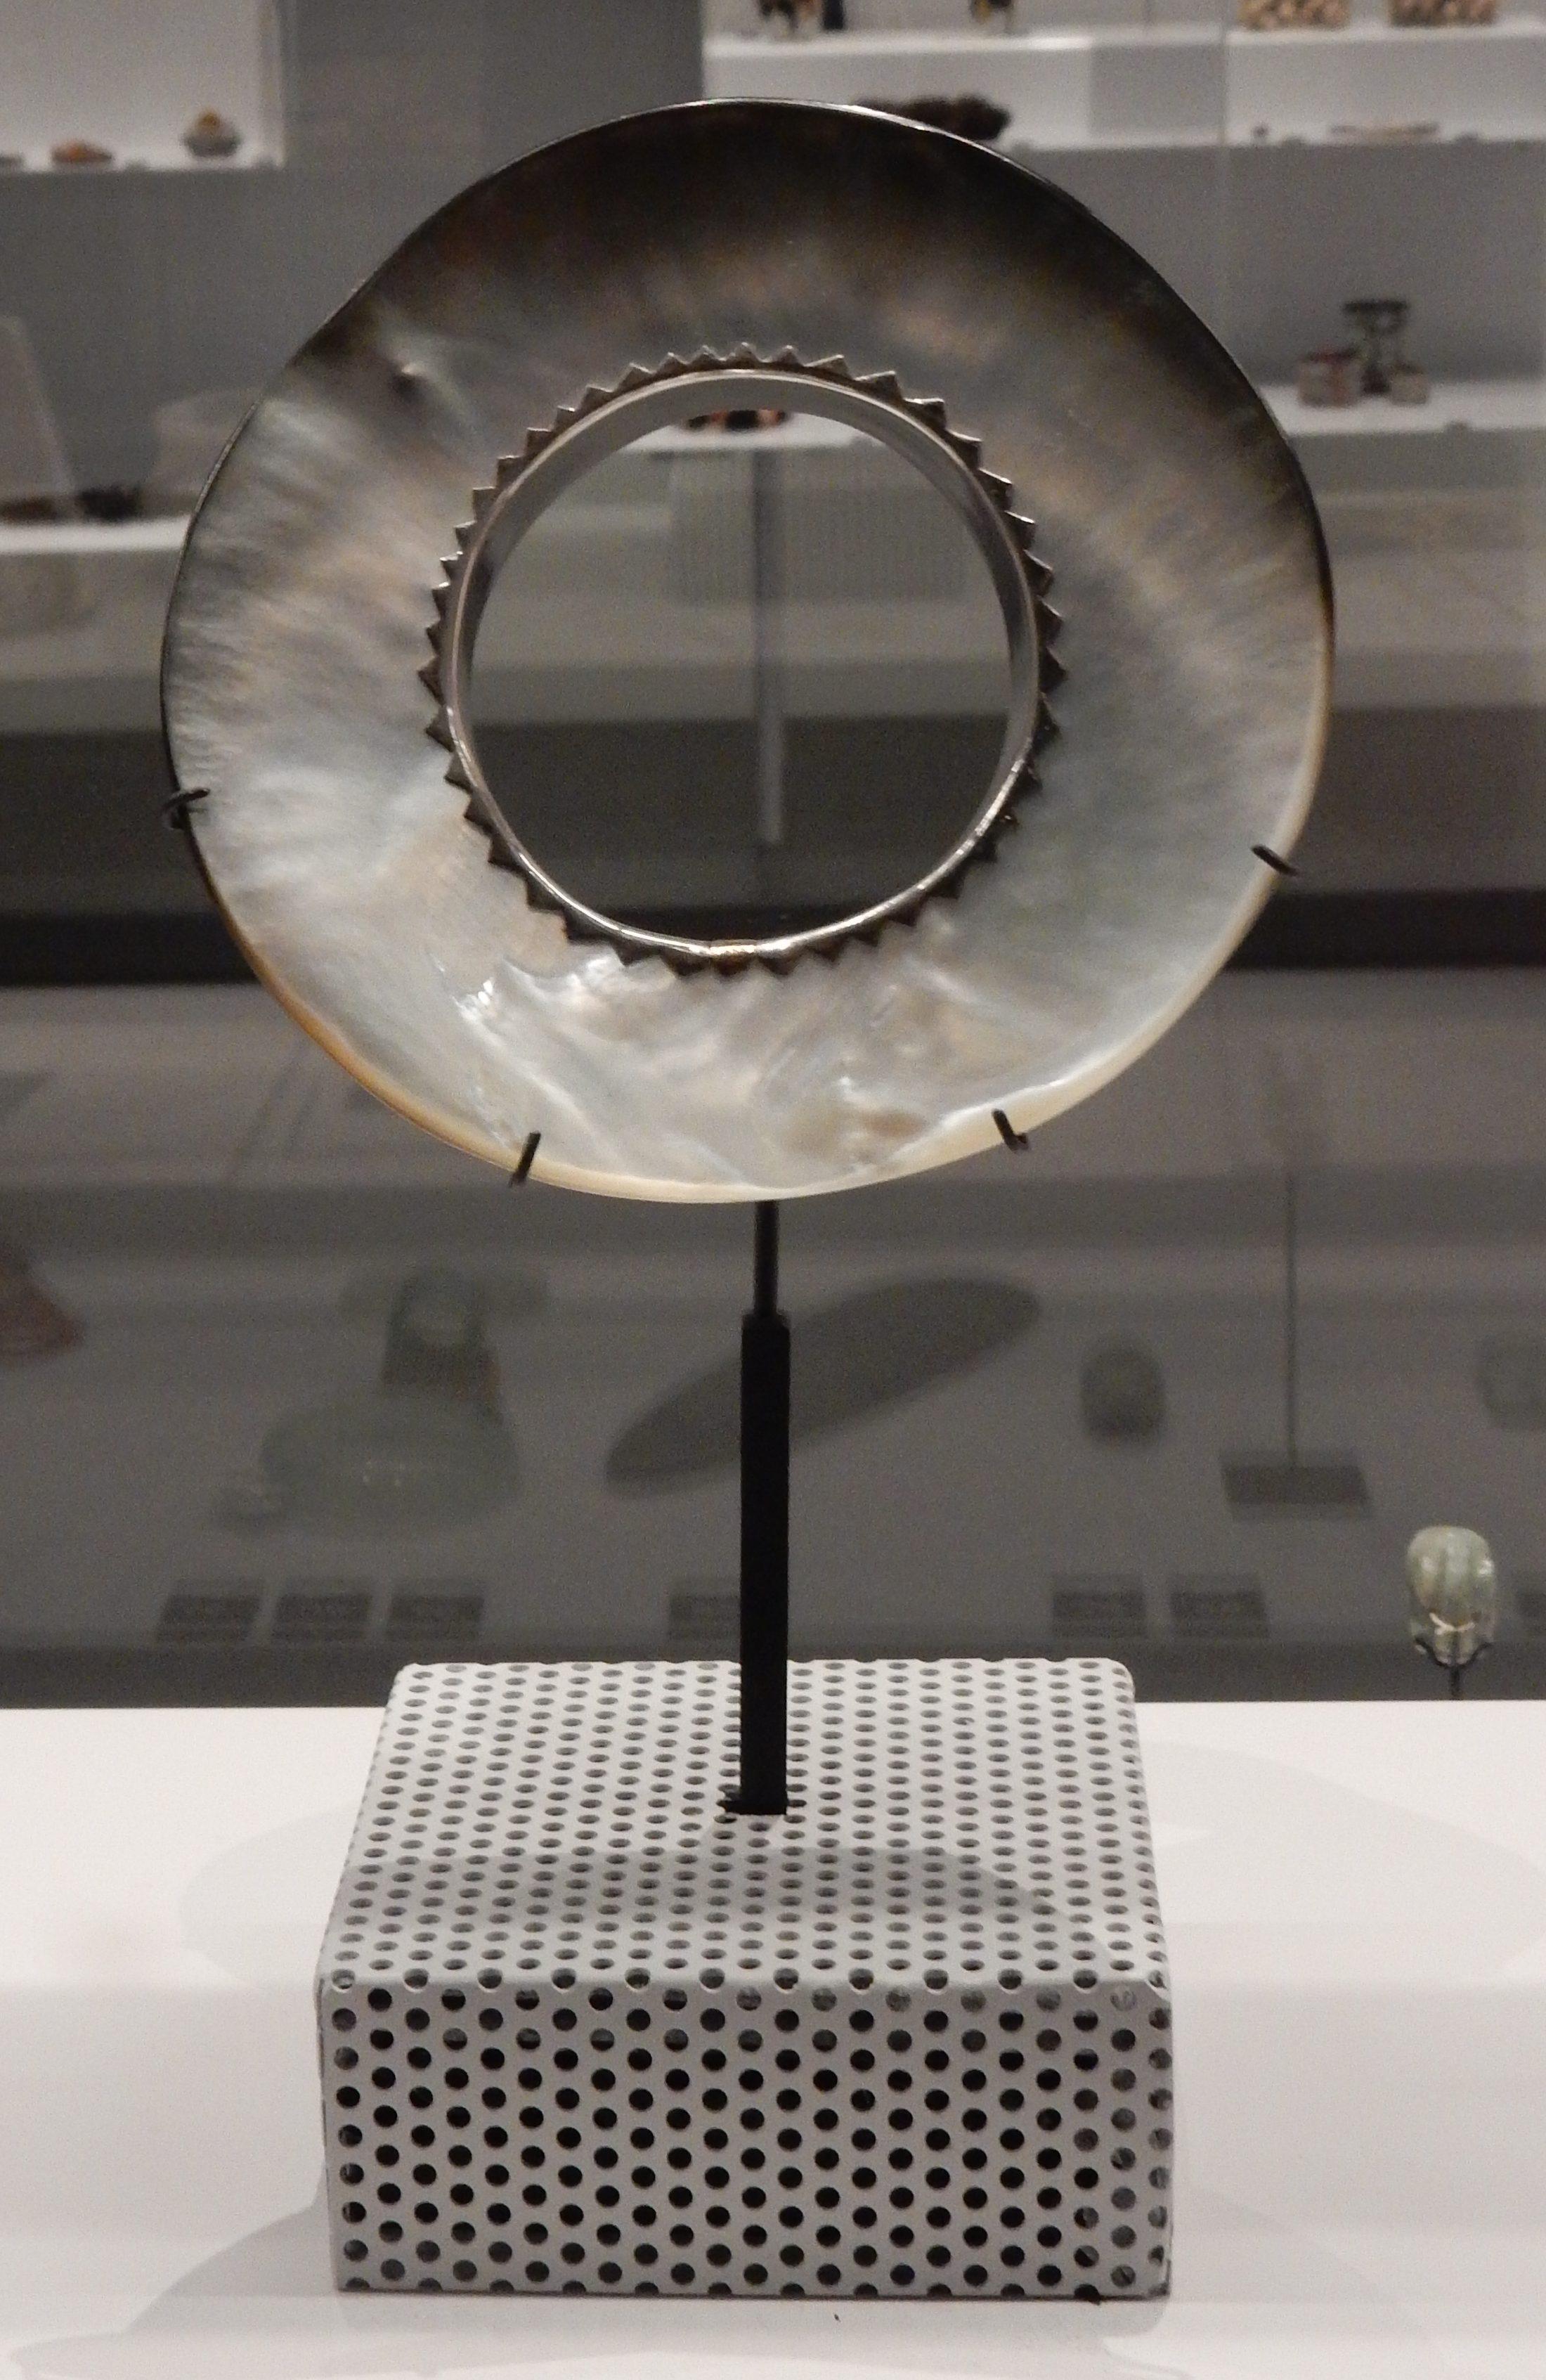 Alan Preston, armband, 1987. Sieraden, makers en dragers, Natuur, Afrika Museum, Berg en Dal. Foto met dank aan Coert Peter Krabbe, 2018, CC BY 4.0